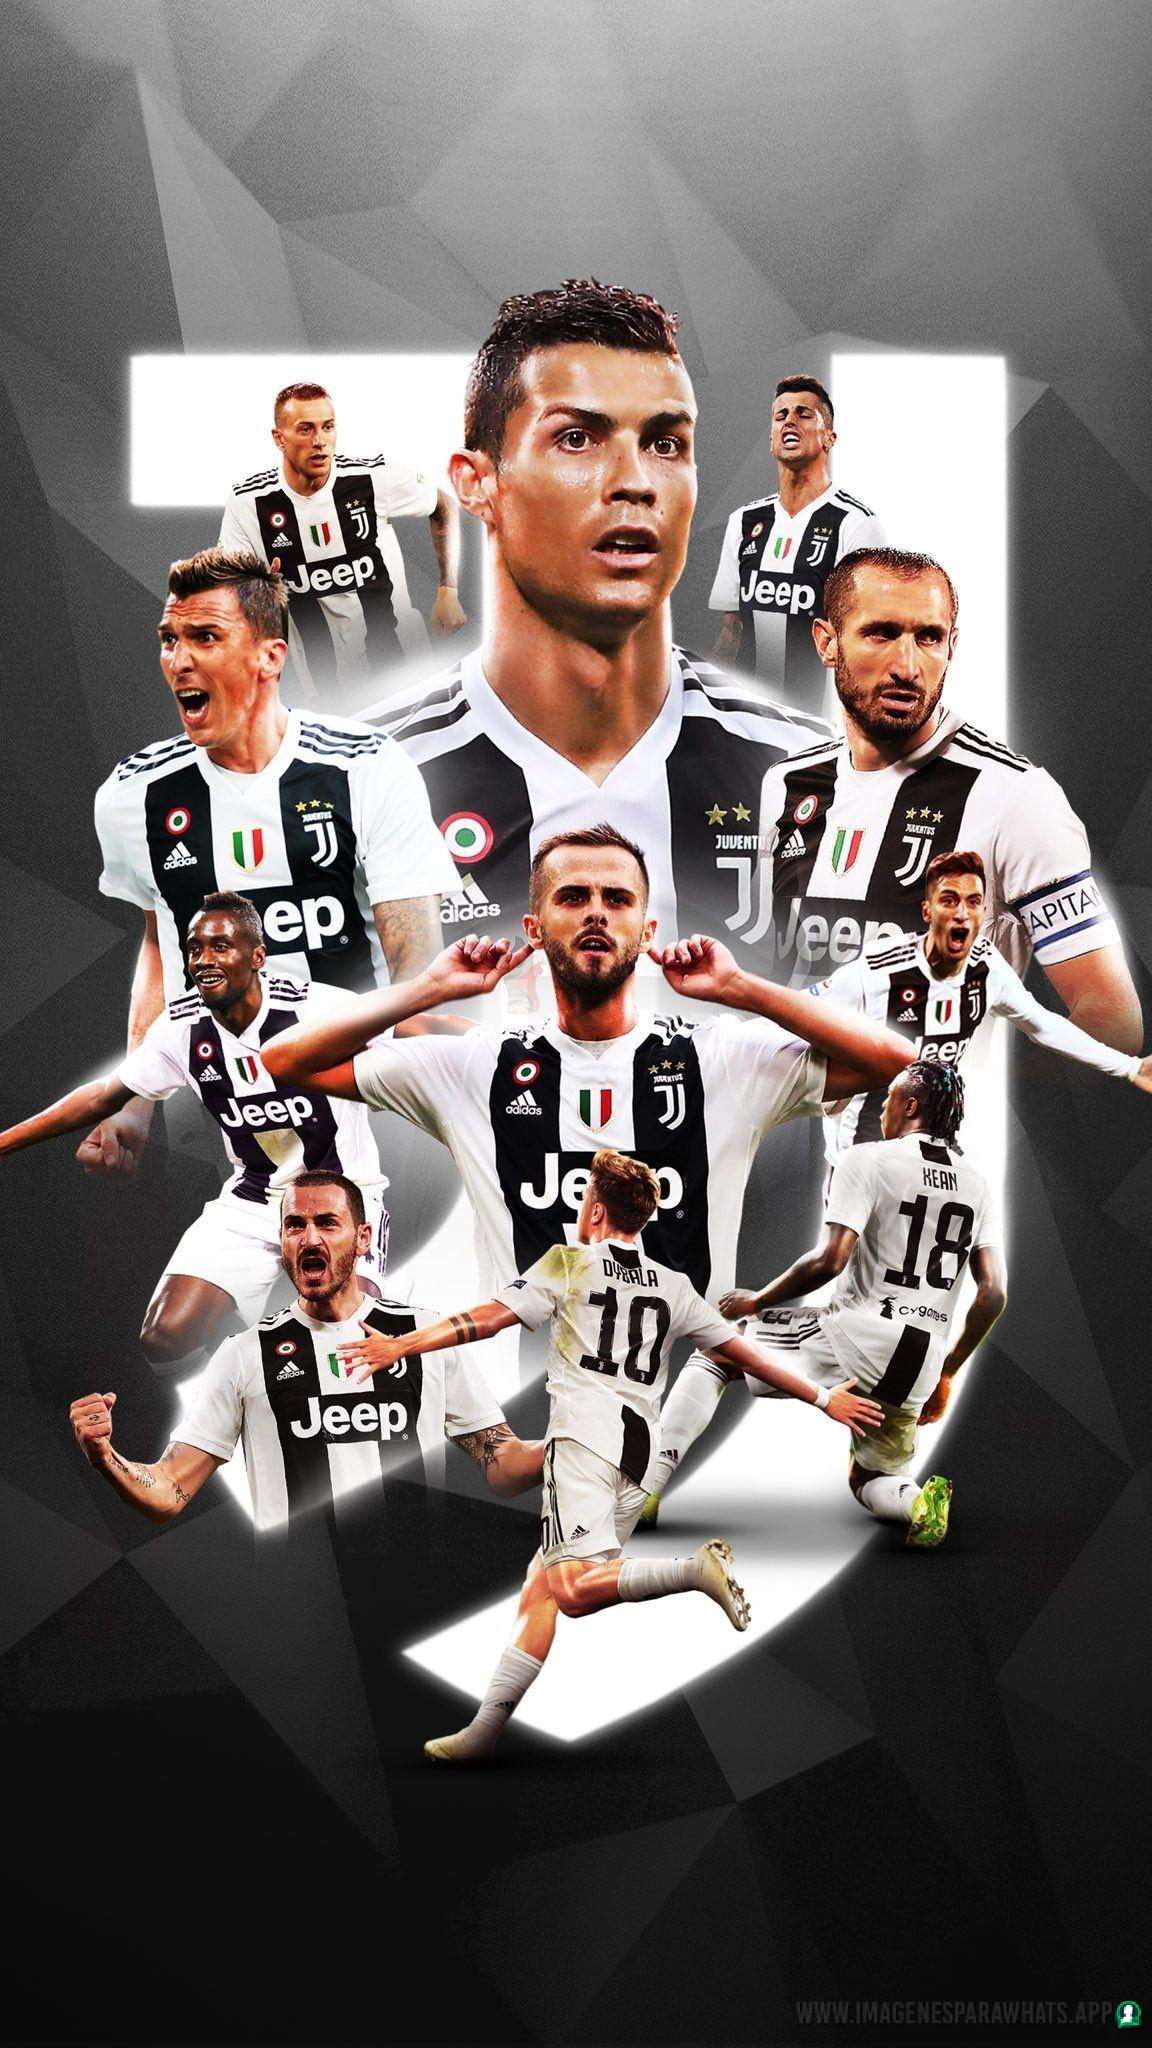 Imagenes de Futbol (1183)